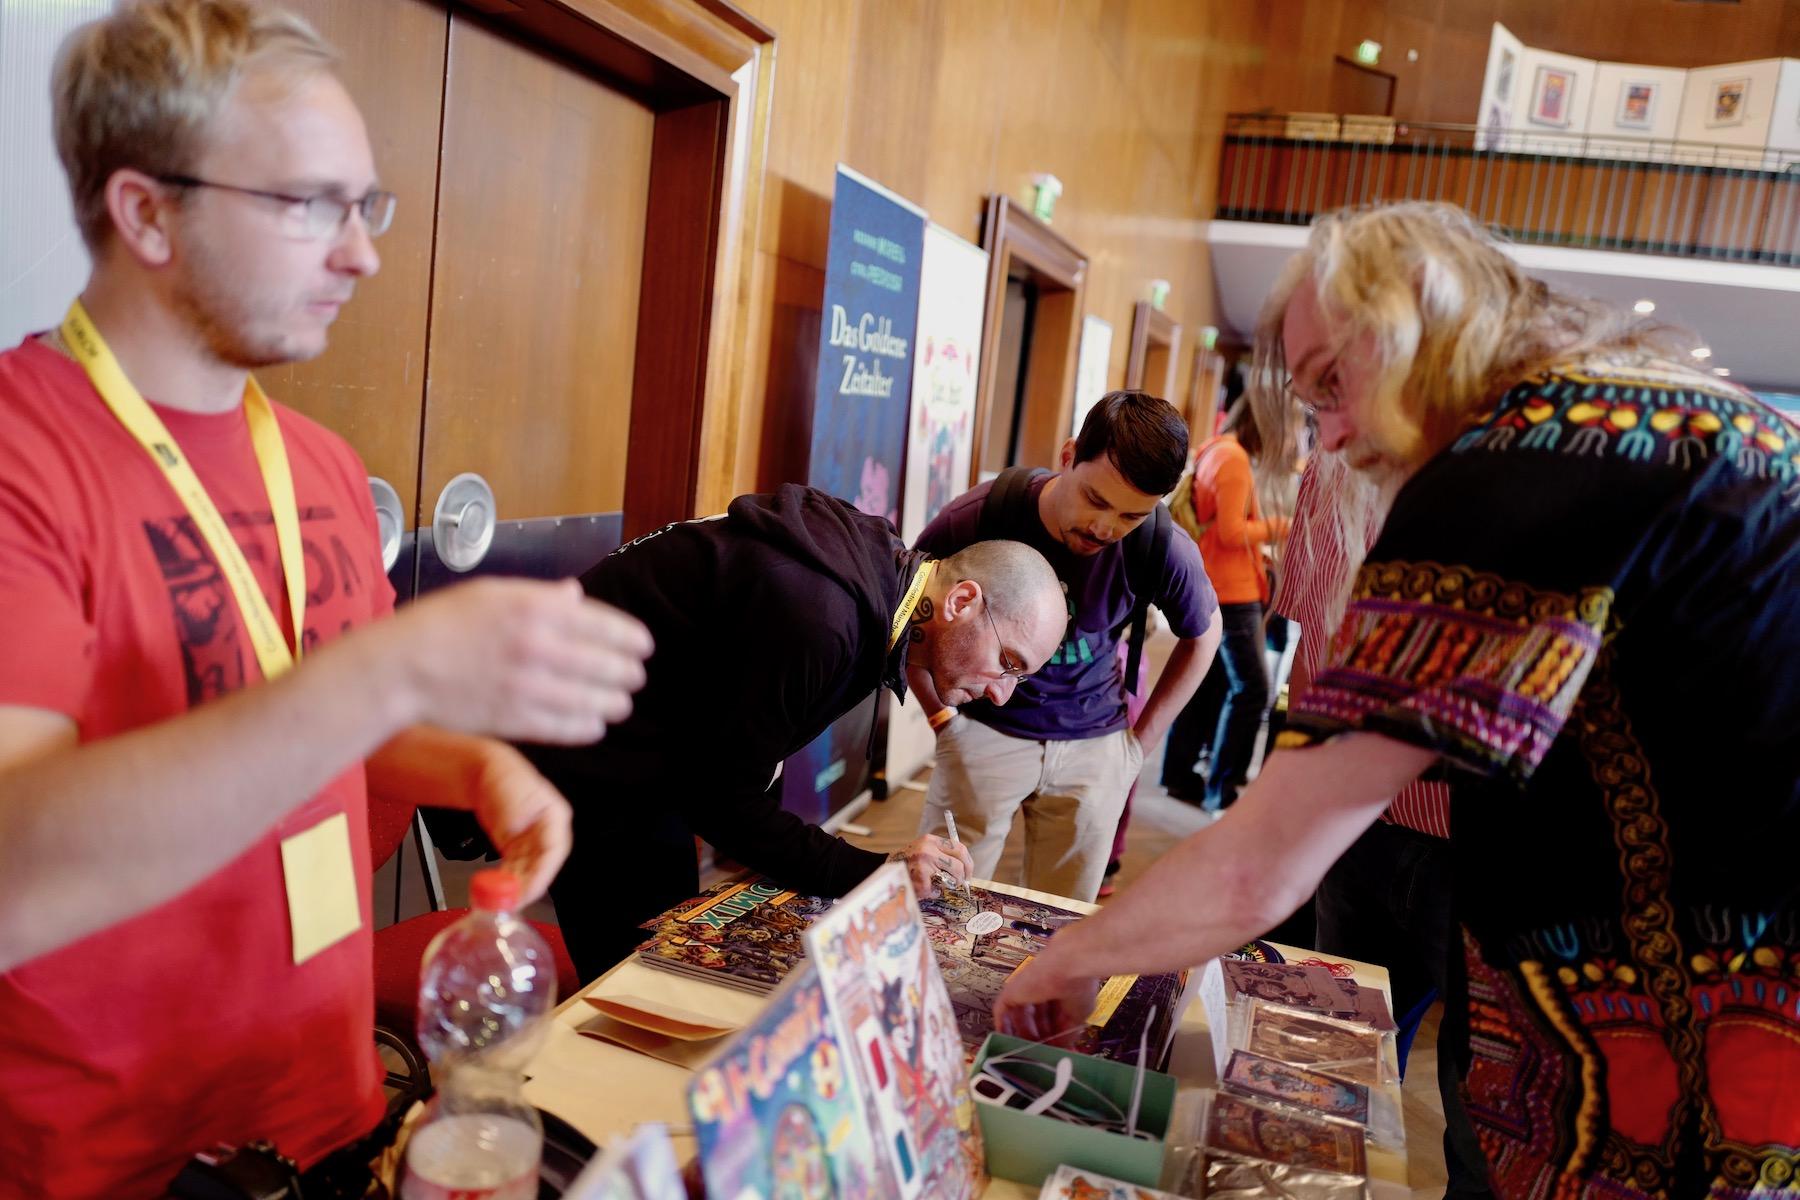 mark_benecke_cfm19_comic_festival_muenchen_u_comix - 18.jpg